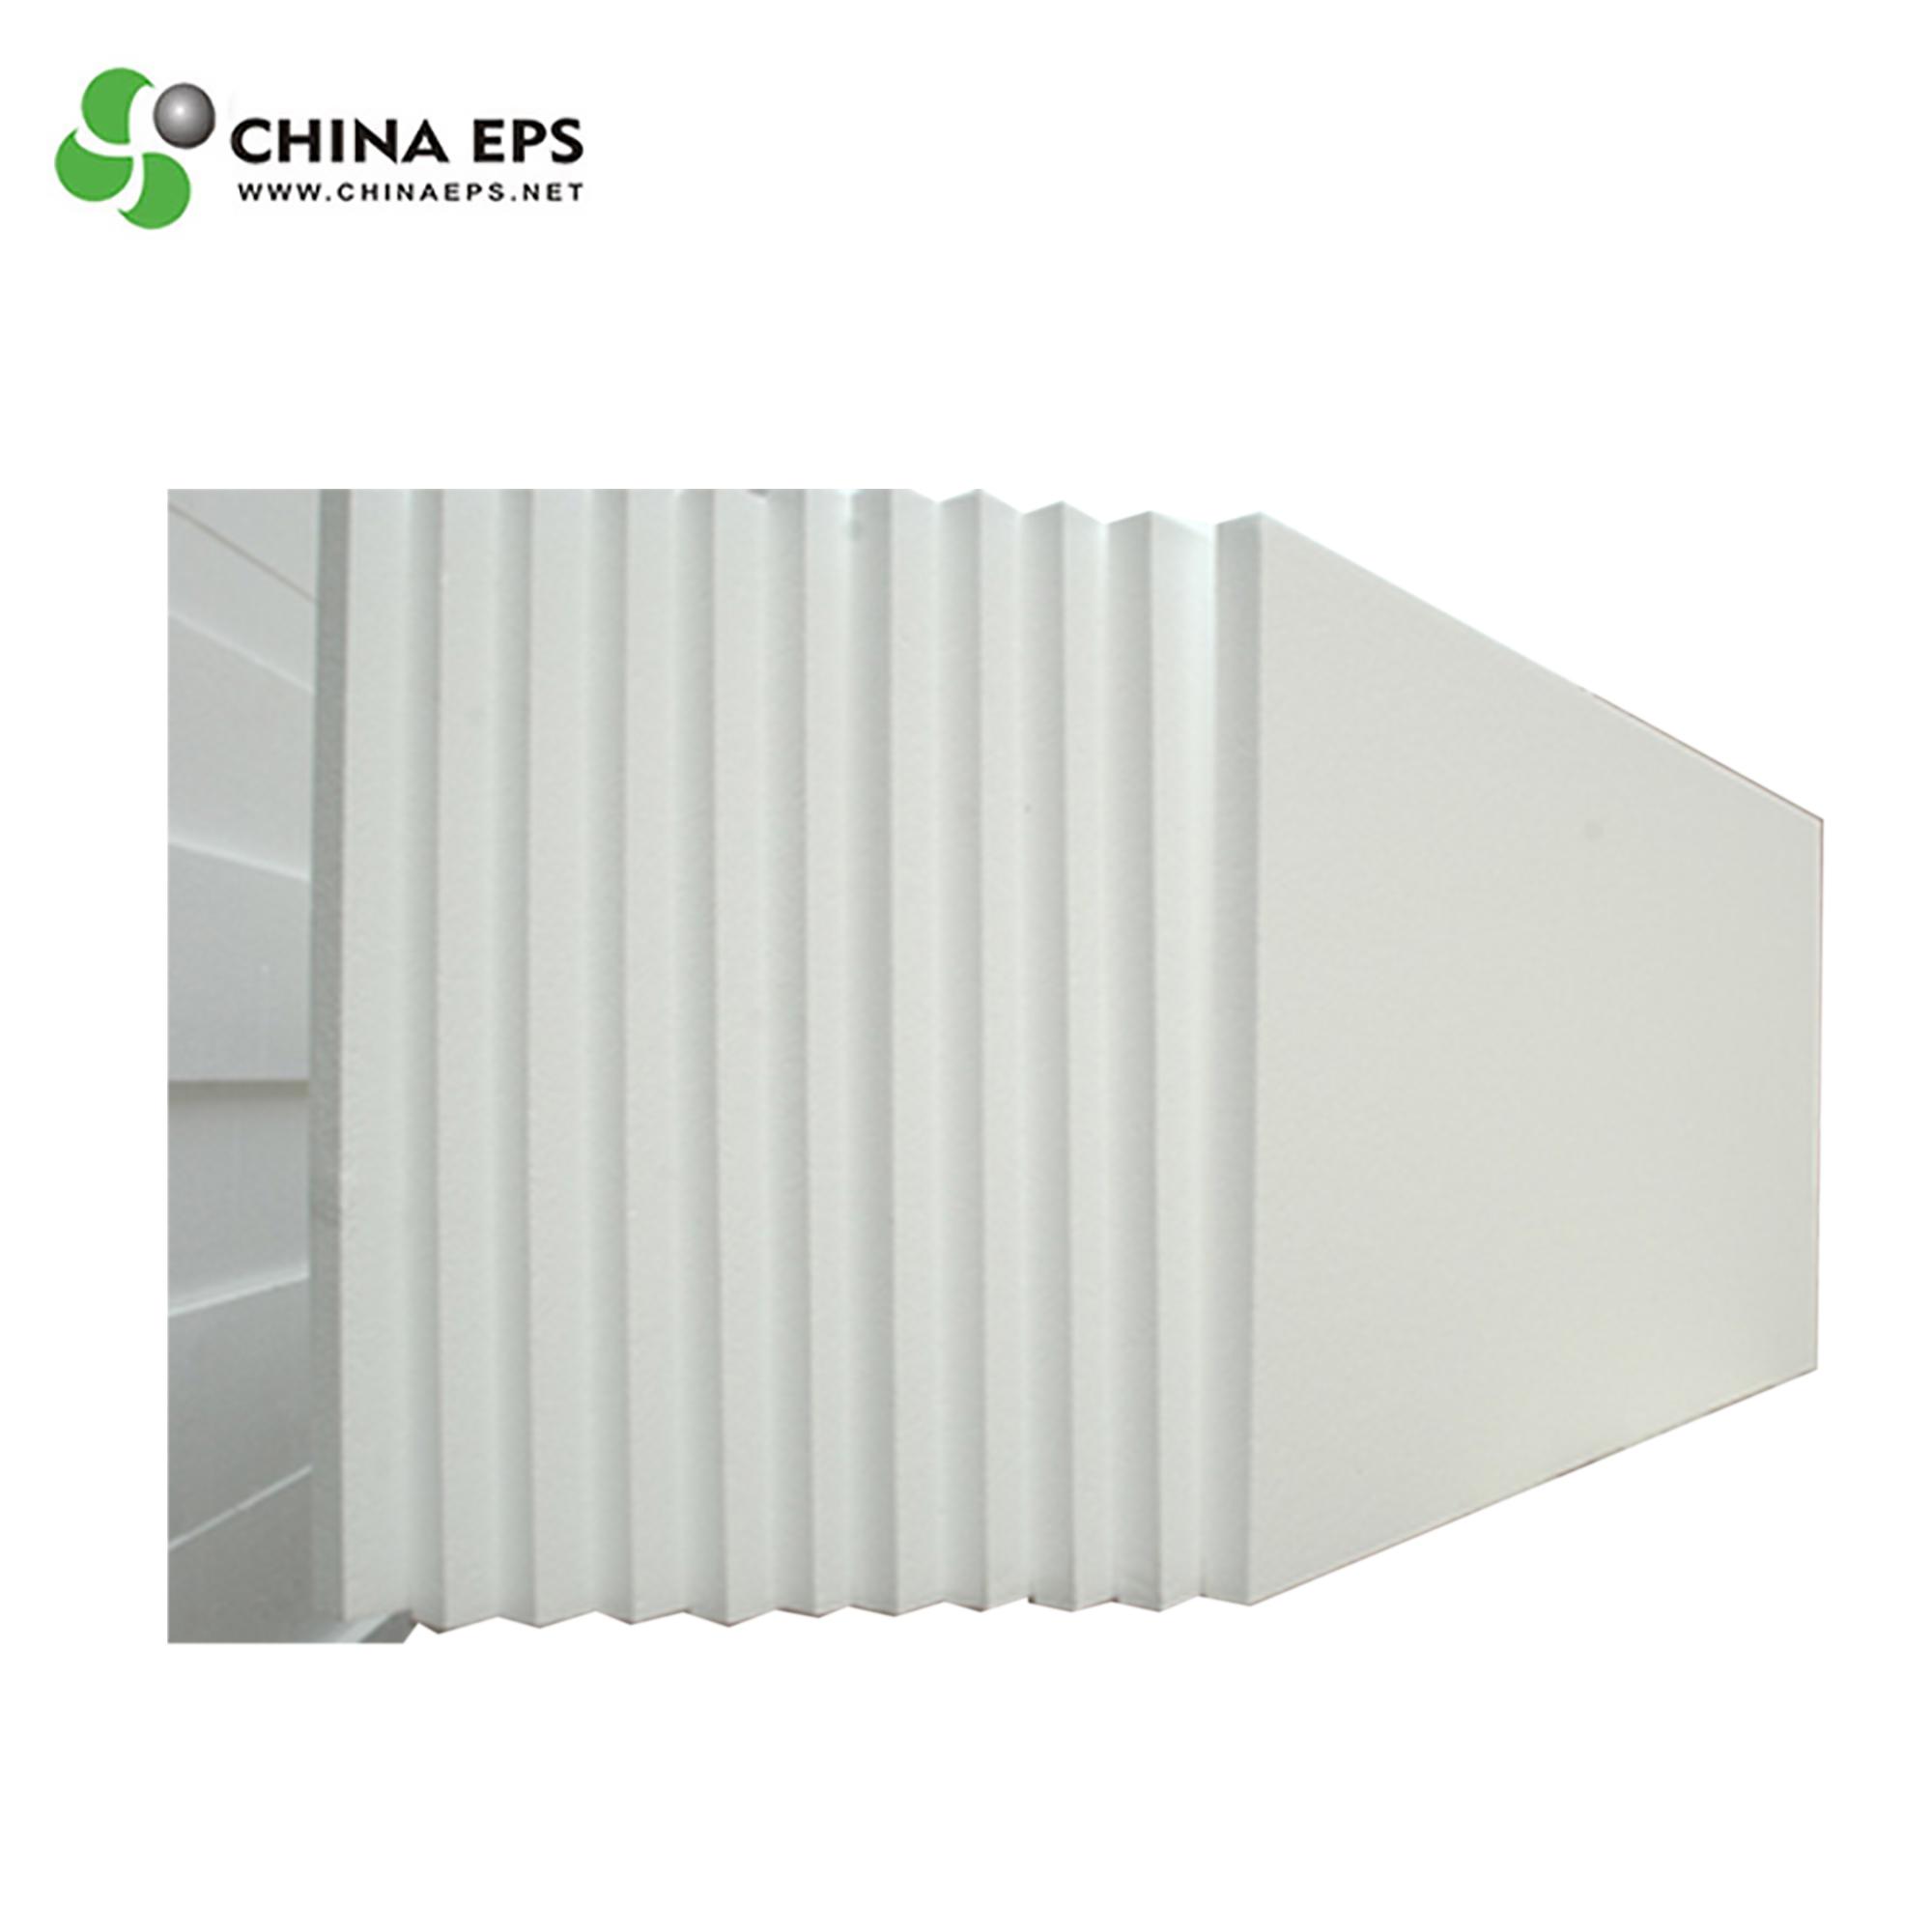 China Eps 301 Raw Material Expanded Polystyrene Foam Sheet - Buy Eps 301  Raw Material,Foam Sheet,Expanded Polystyrene Sheet Product on Alibaba com